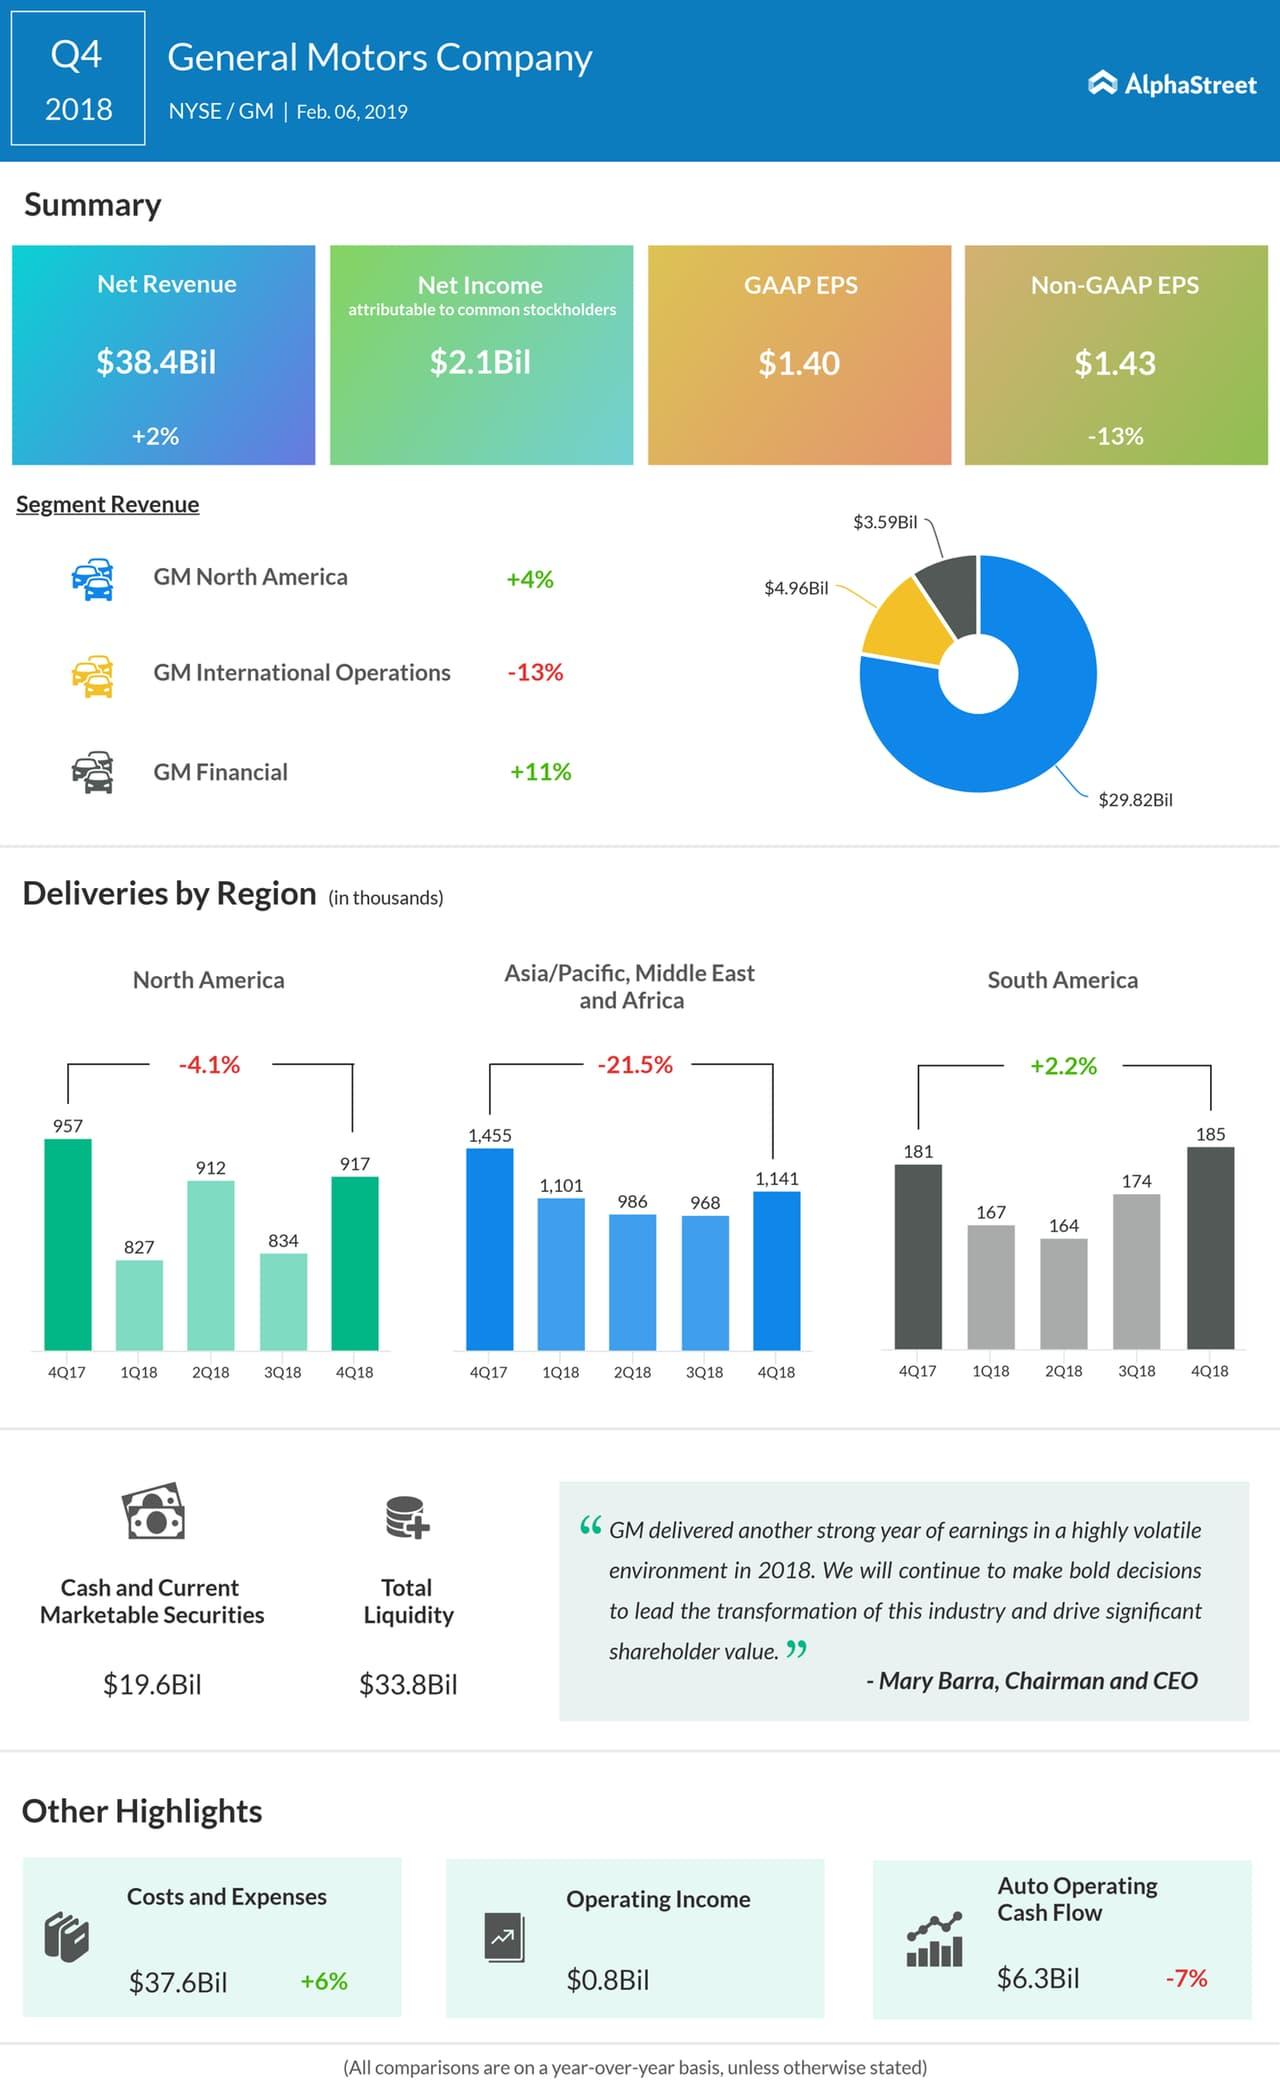 General Motors fourth quarter 2018 earnings infographic